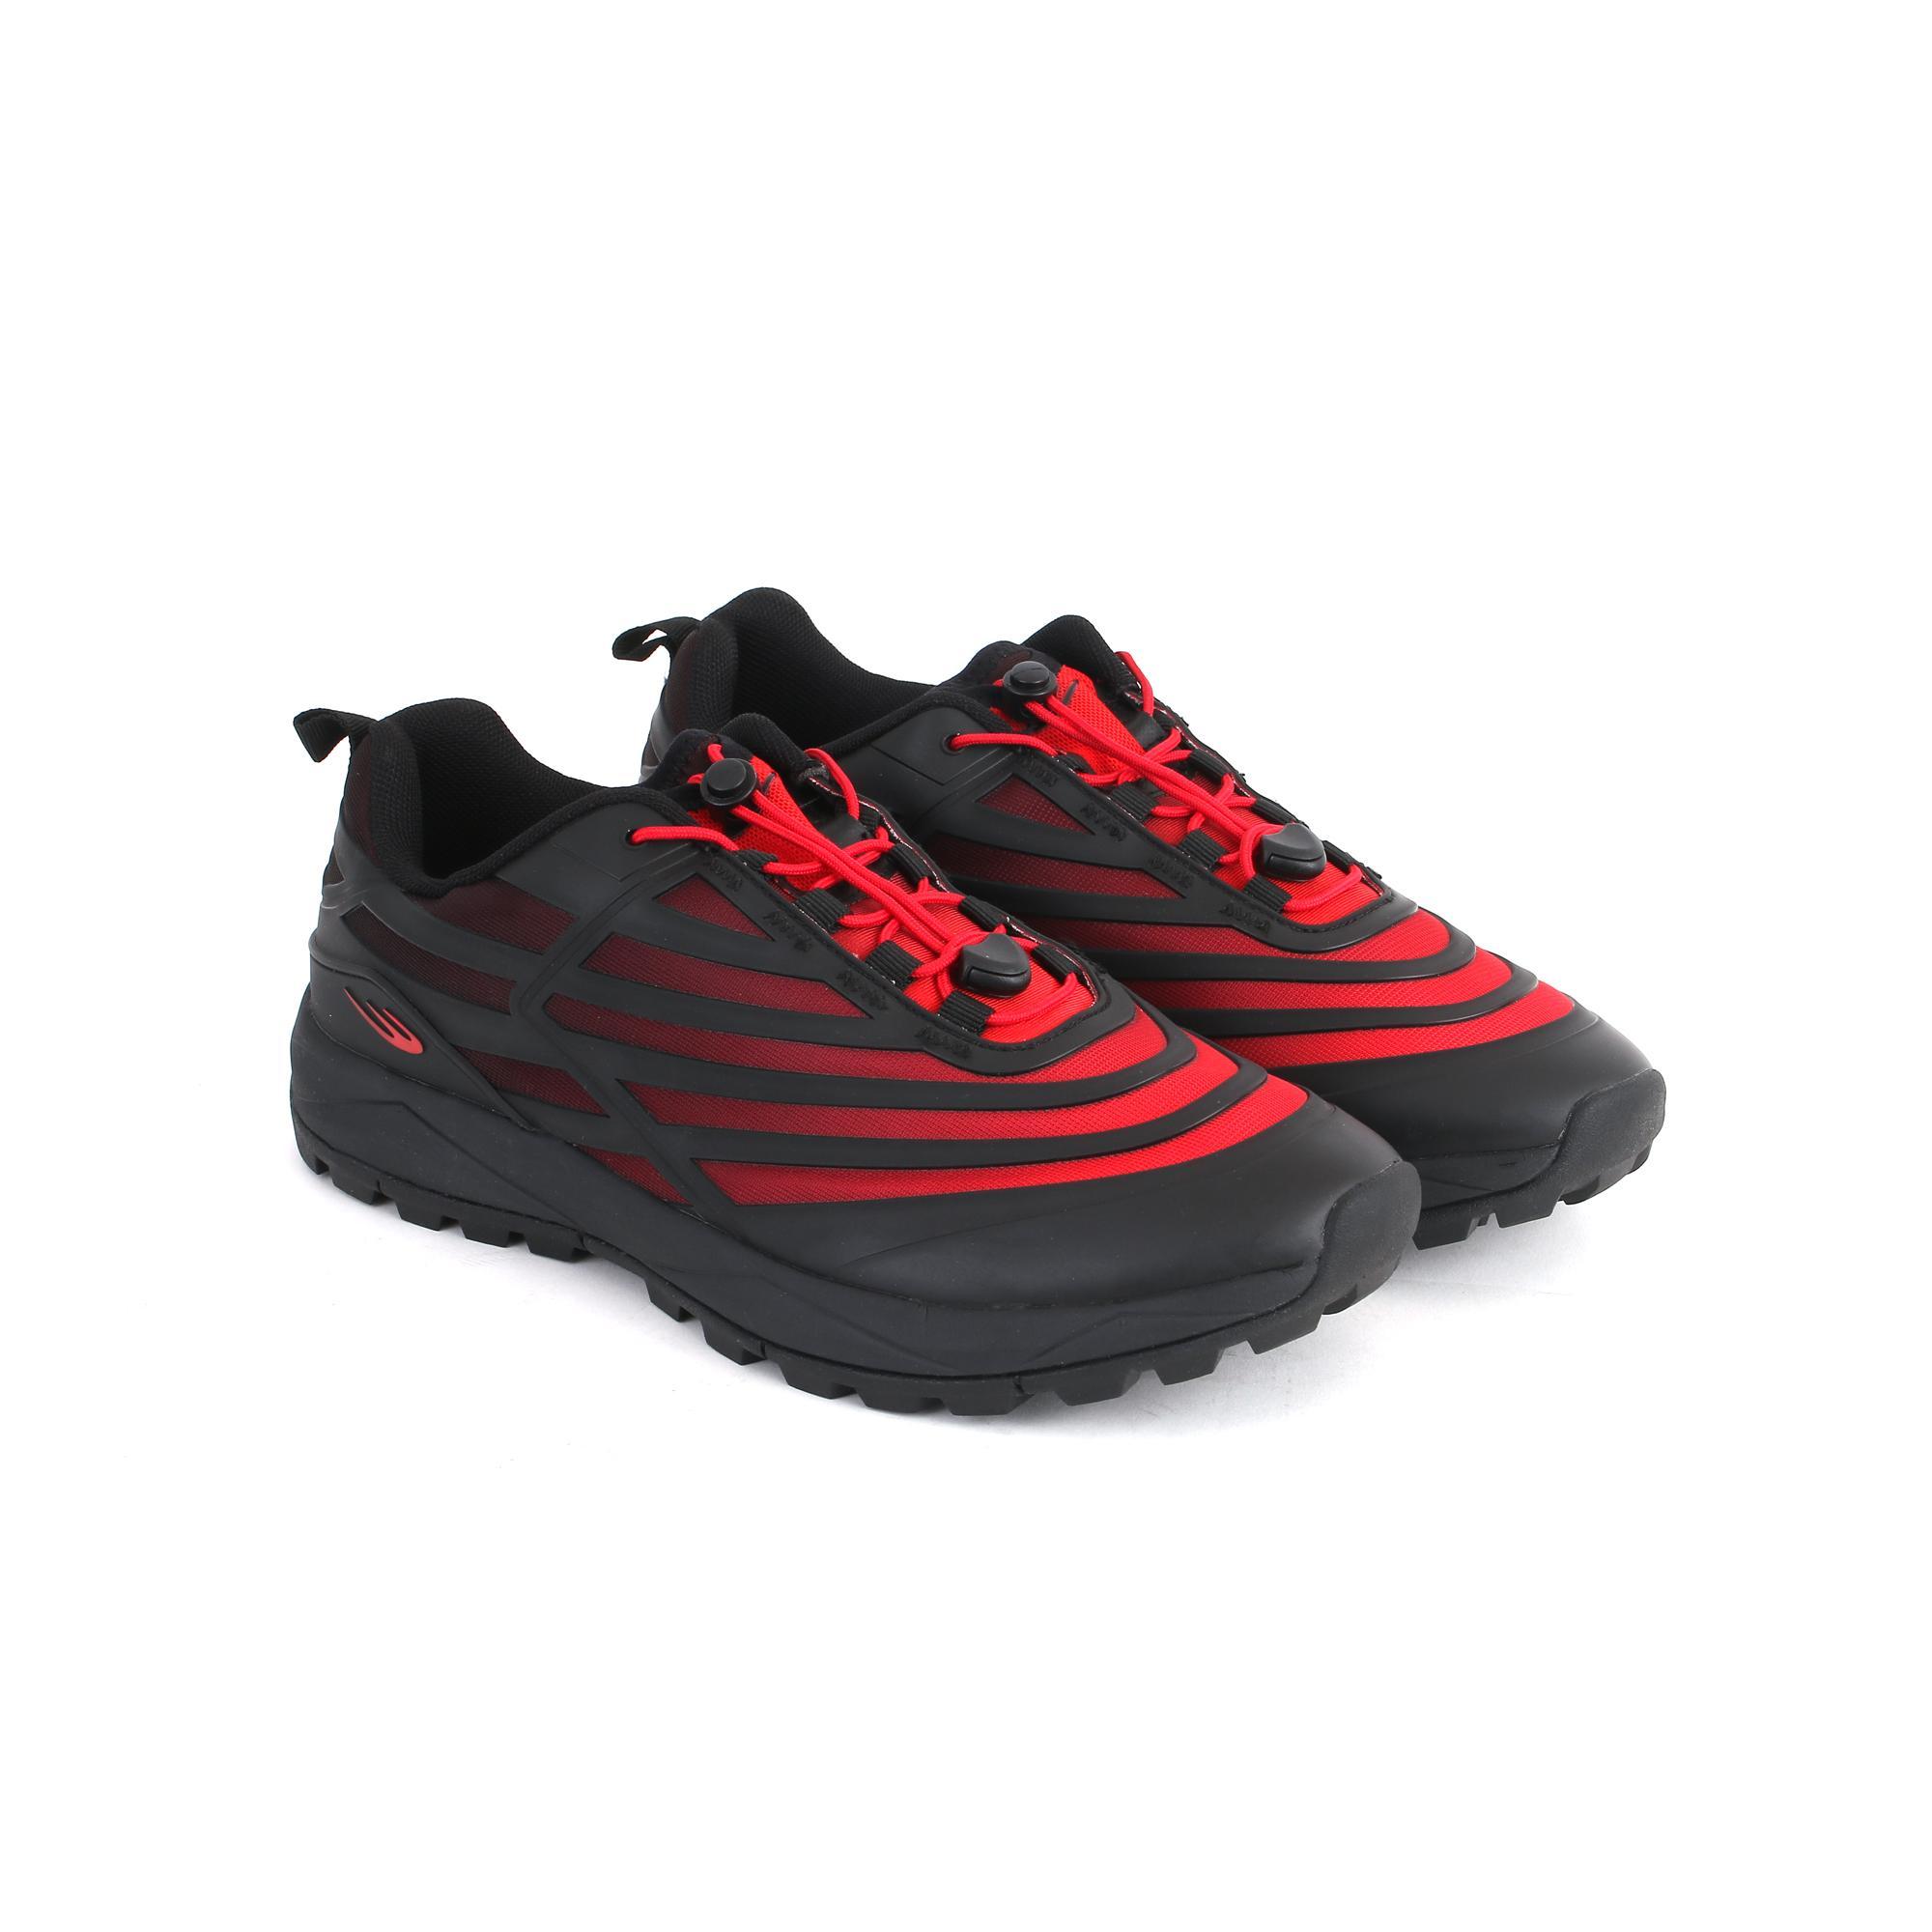 hiking shoes world balance